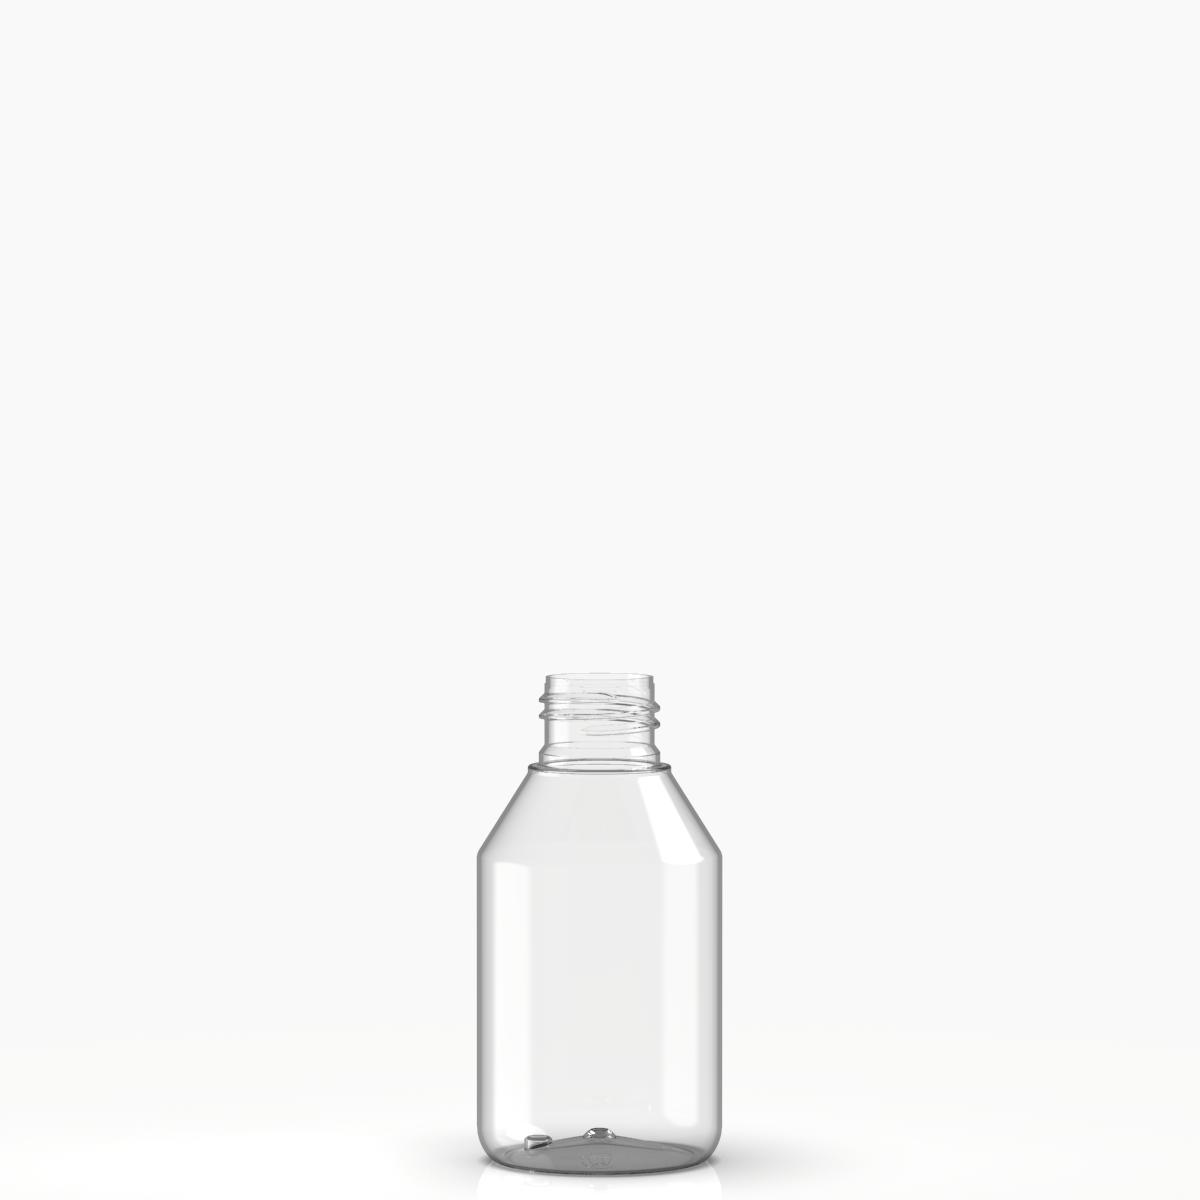 Round bottle 100 ml PET, neck 24/410, style BERNA